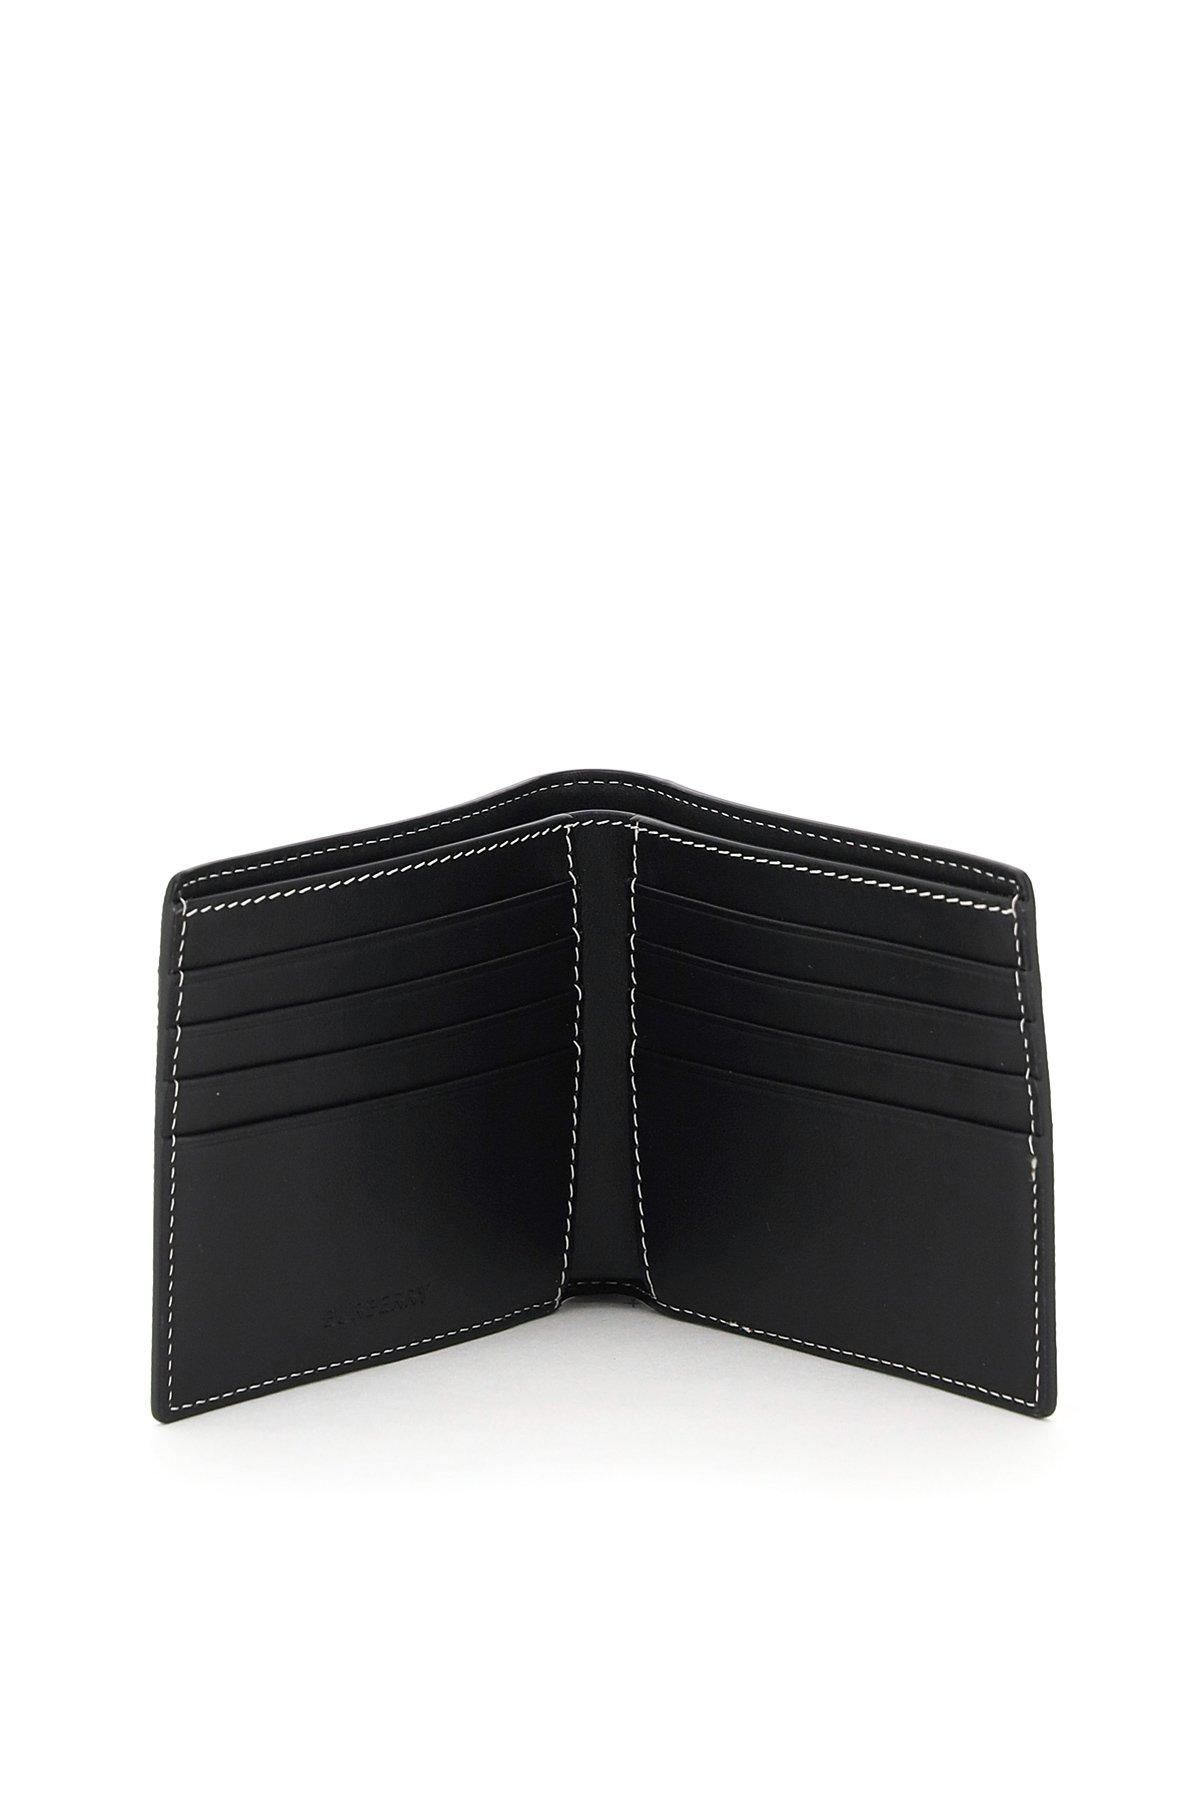 Burberry portafoglio bifold